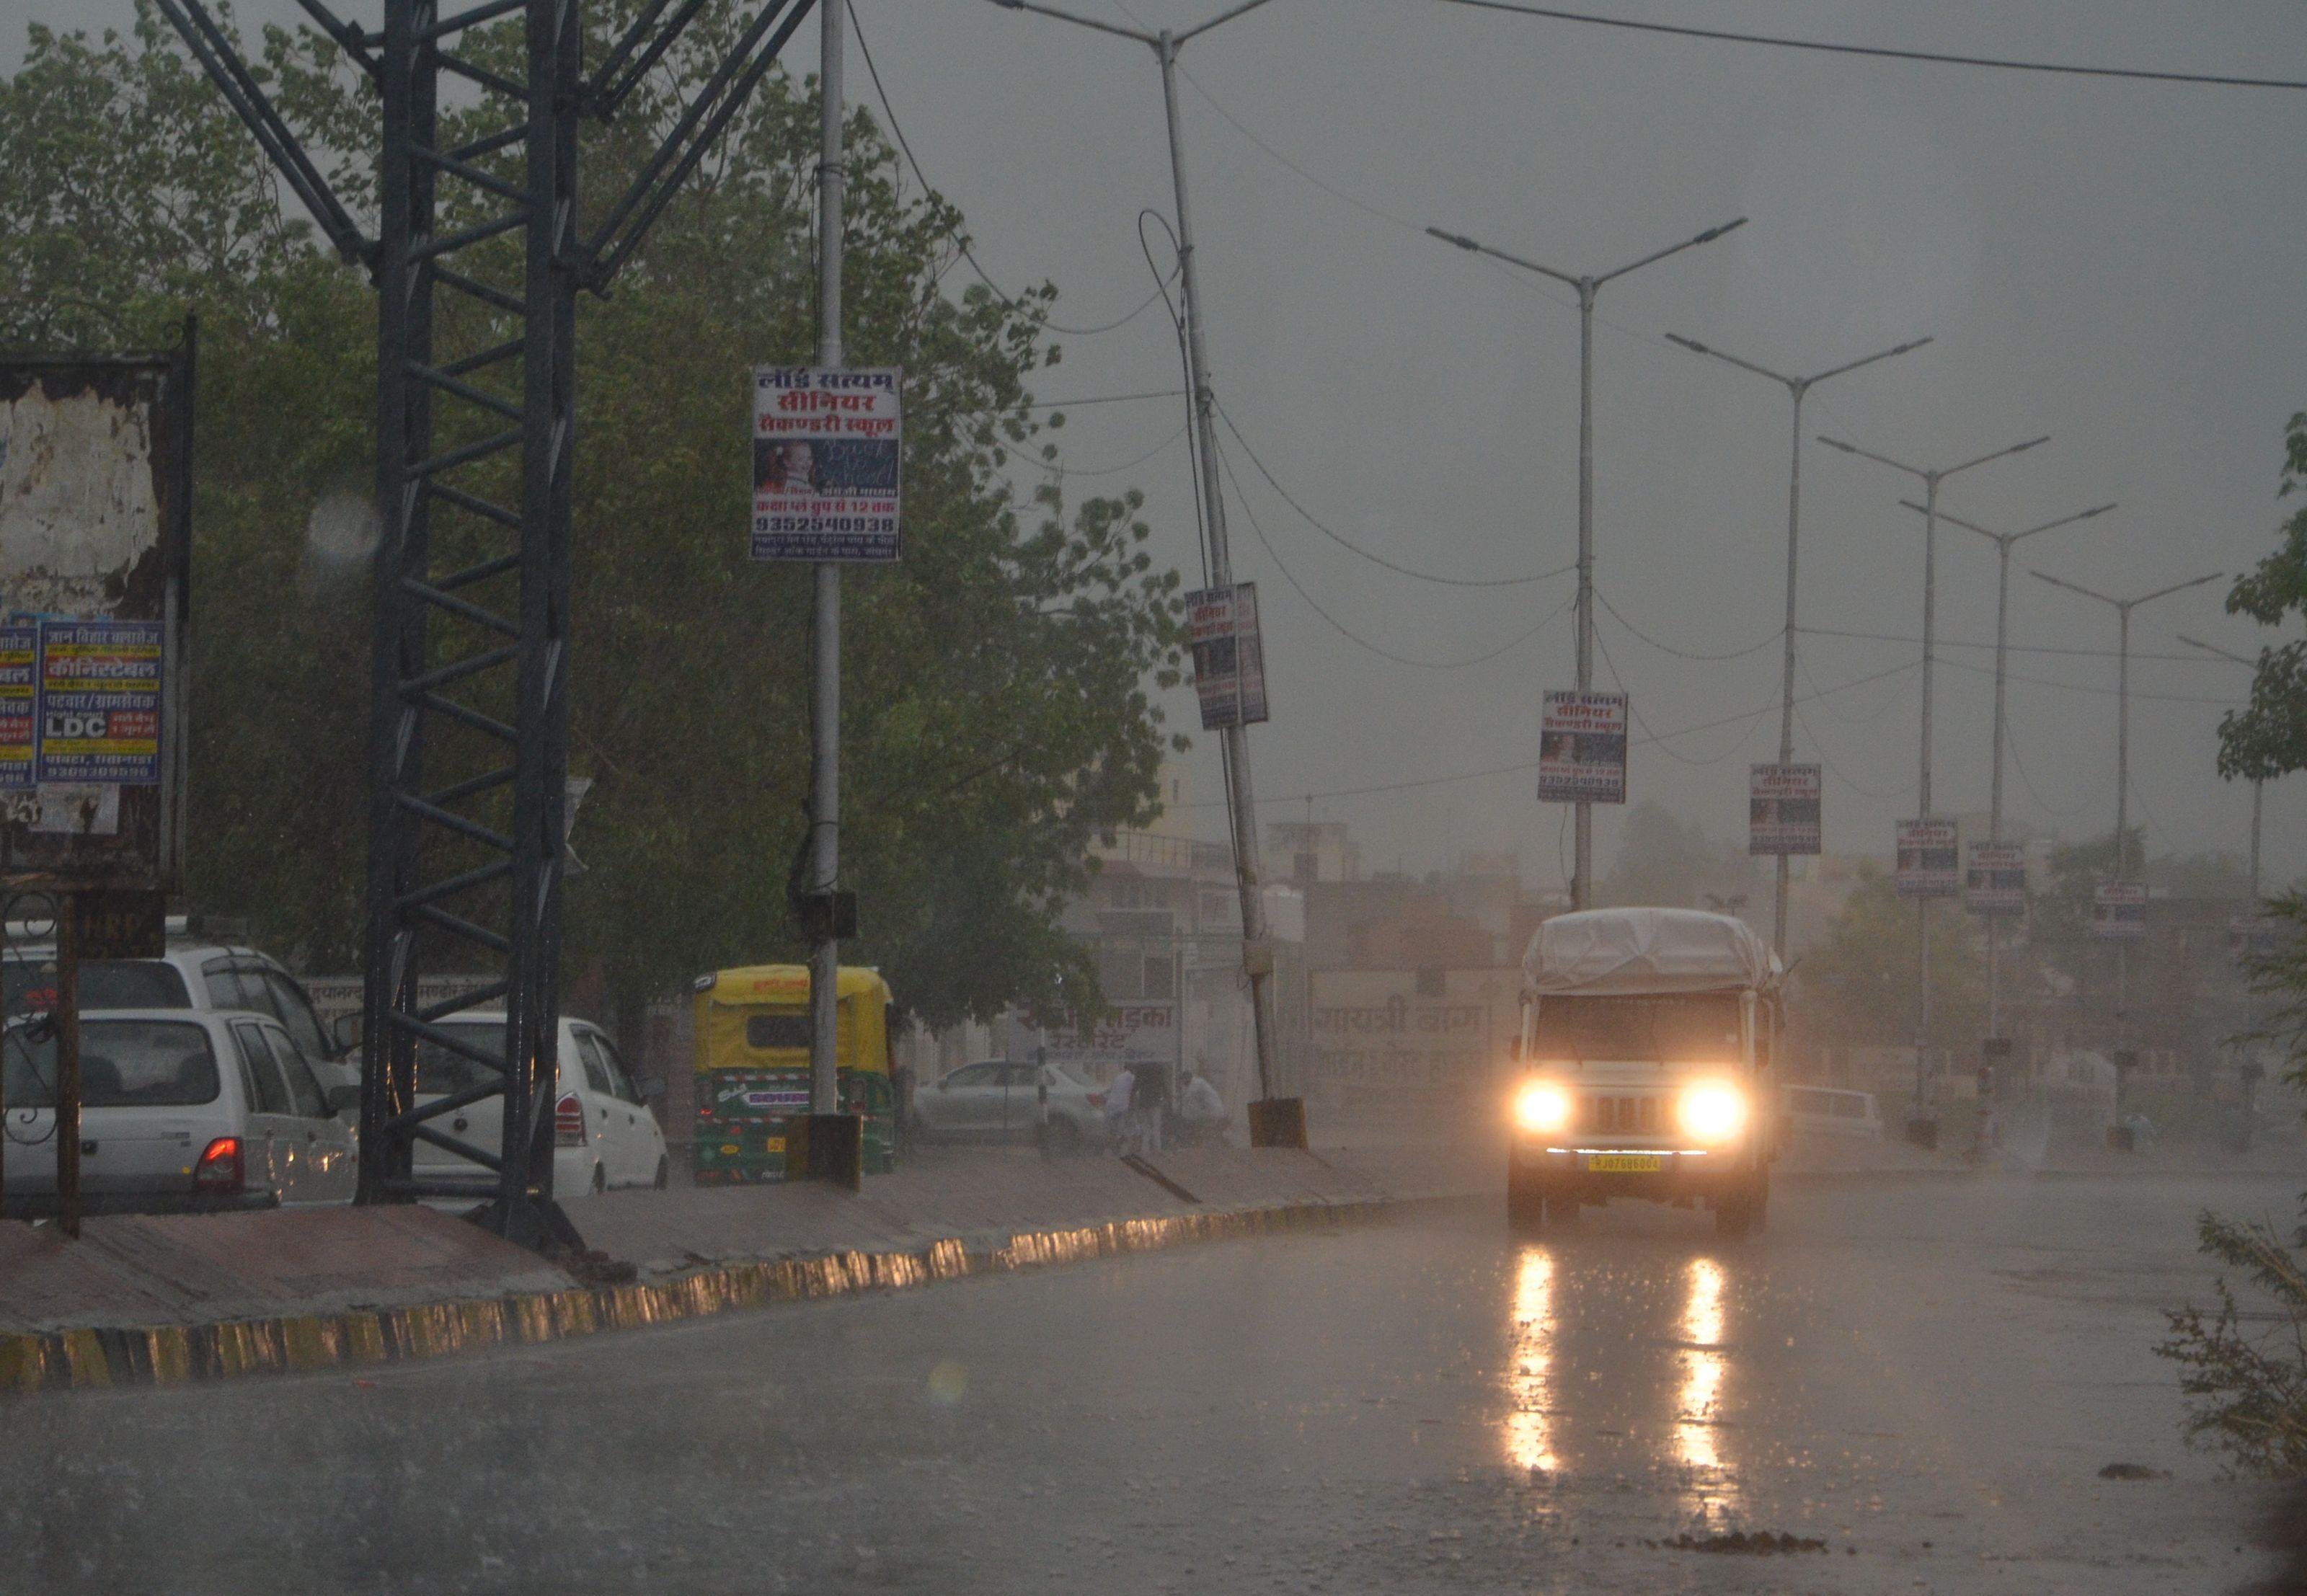 जोधपुर: मानसून की 153 प्रतिशत बारिश, चारों बांध सूखे